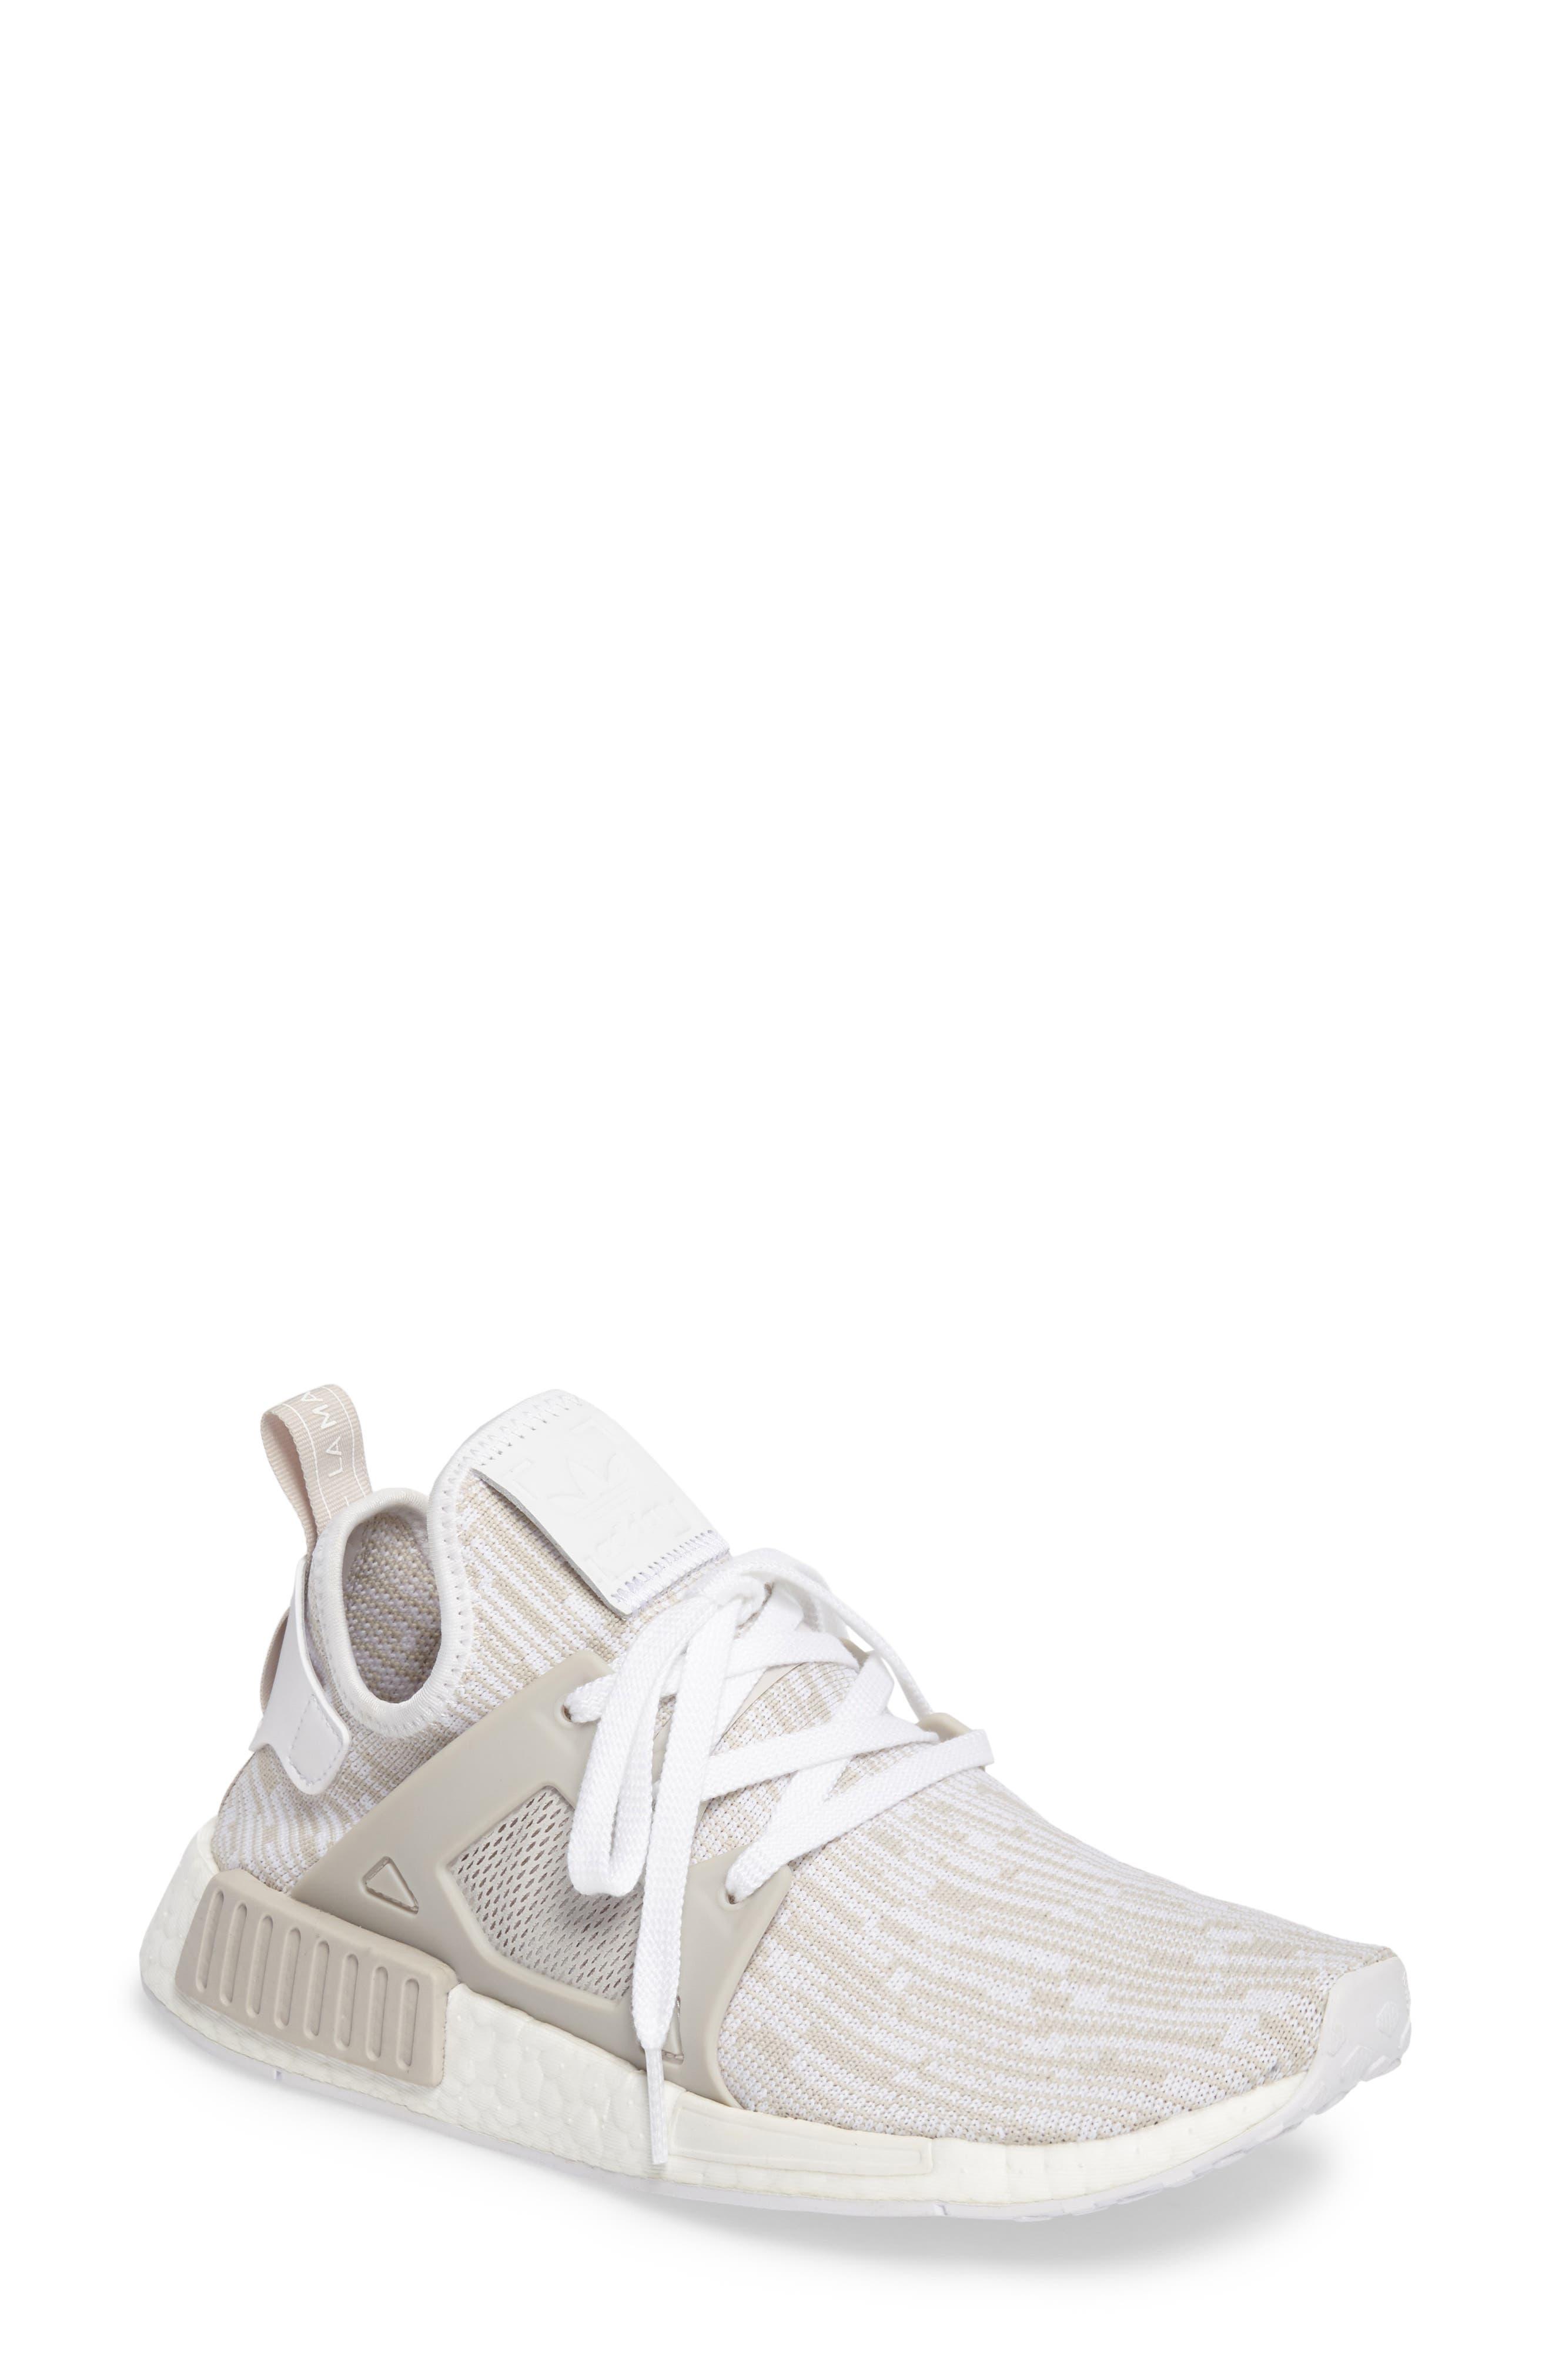 adidas NMD XR1 Athletic Shoe (Women)